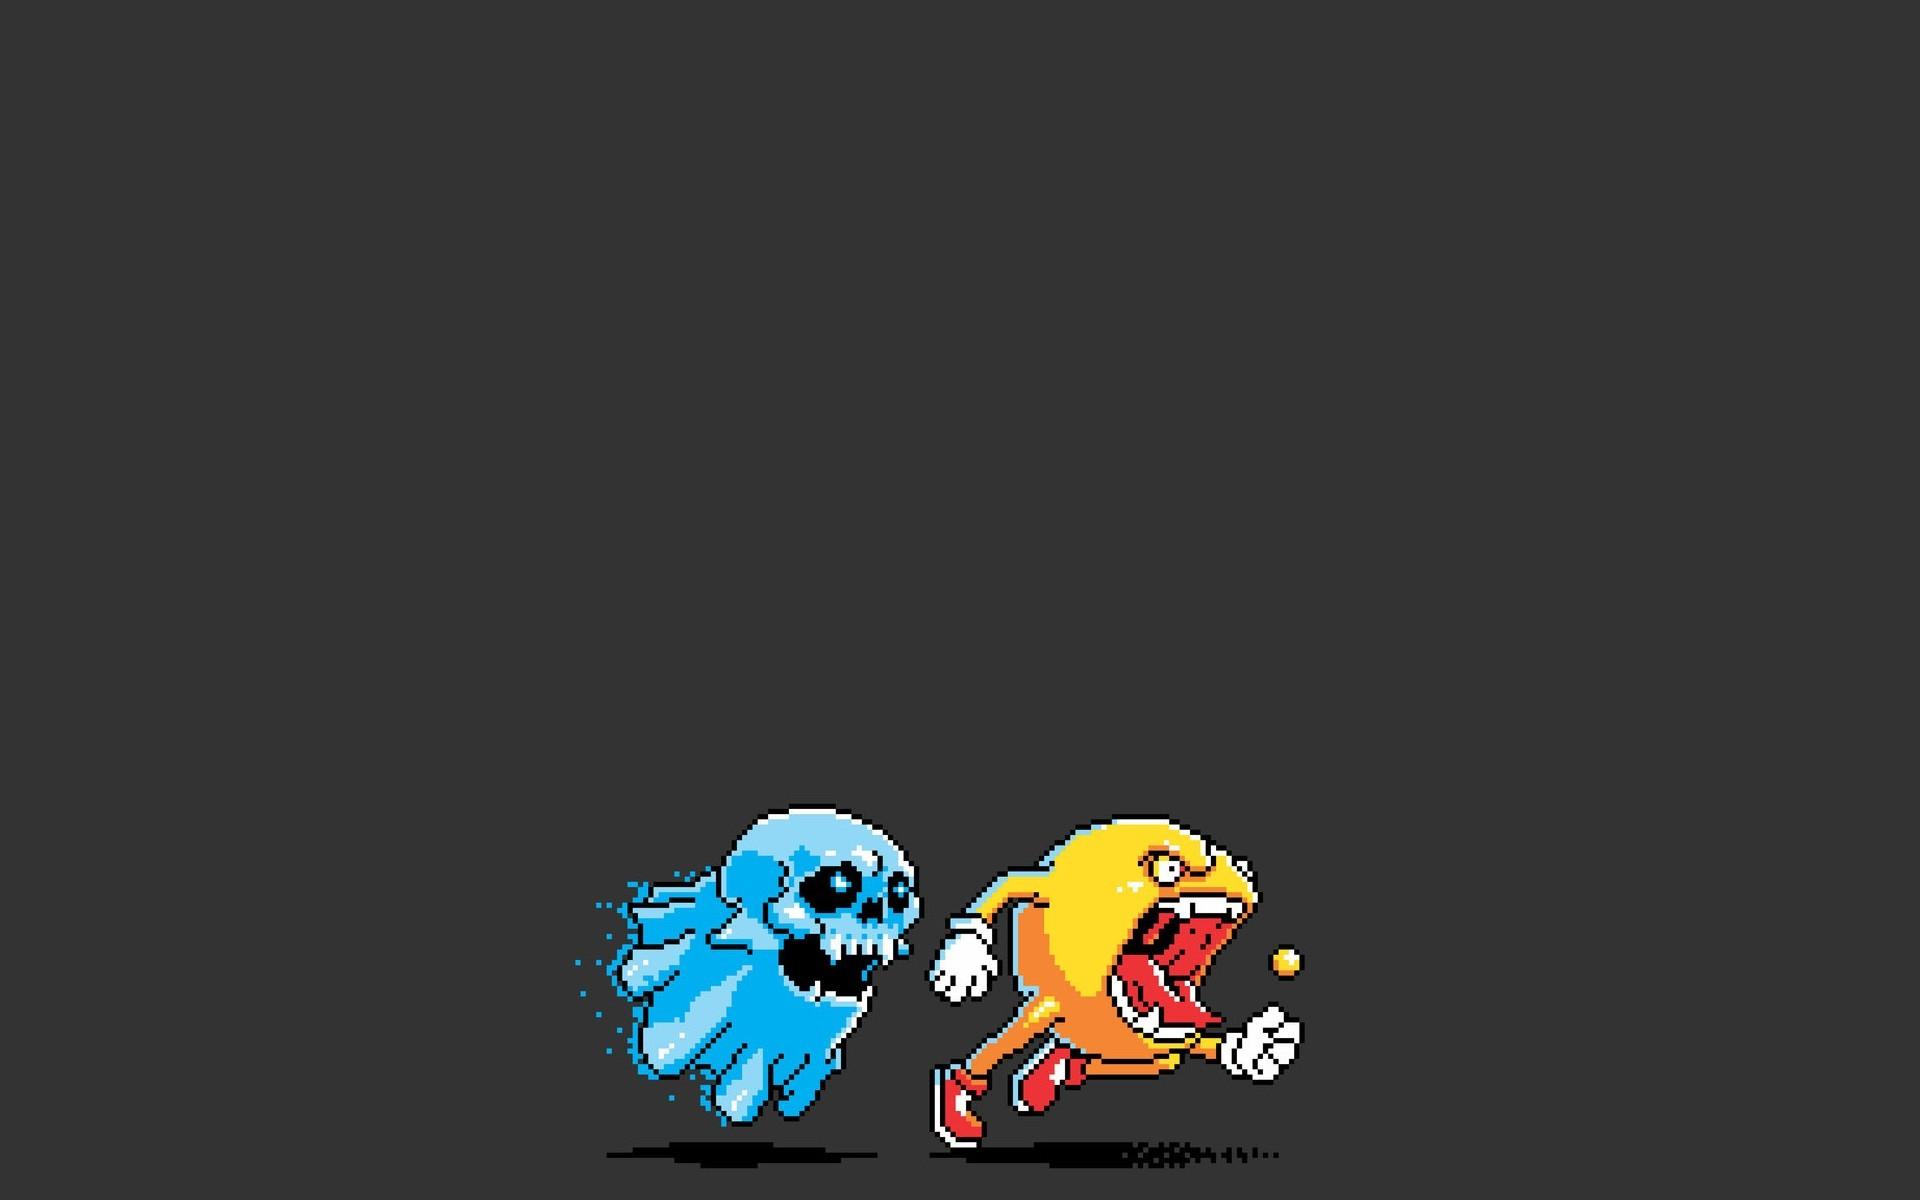 Res: 1920x1200, Pac-Man HD Wallpaper | Hintergrund |  | ID:284128 - Wallpaper Abyss